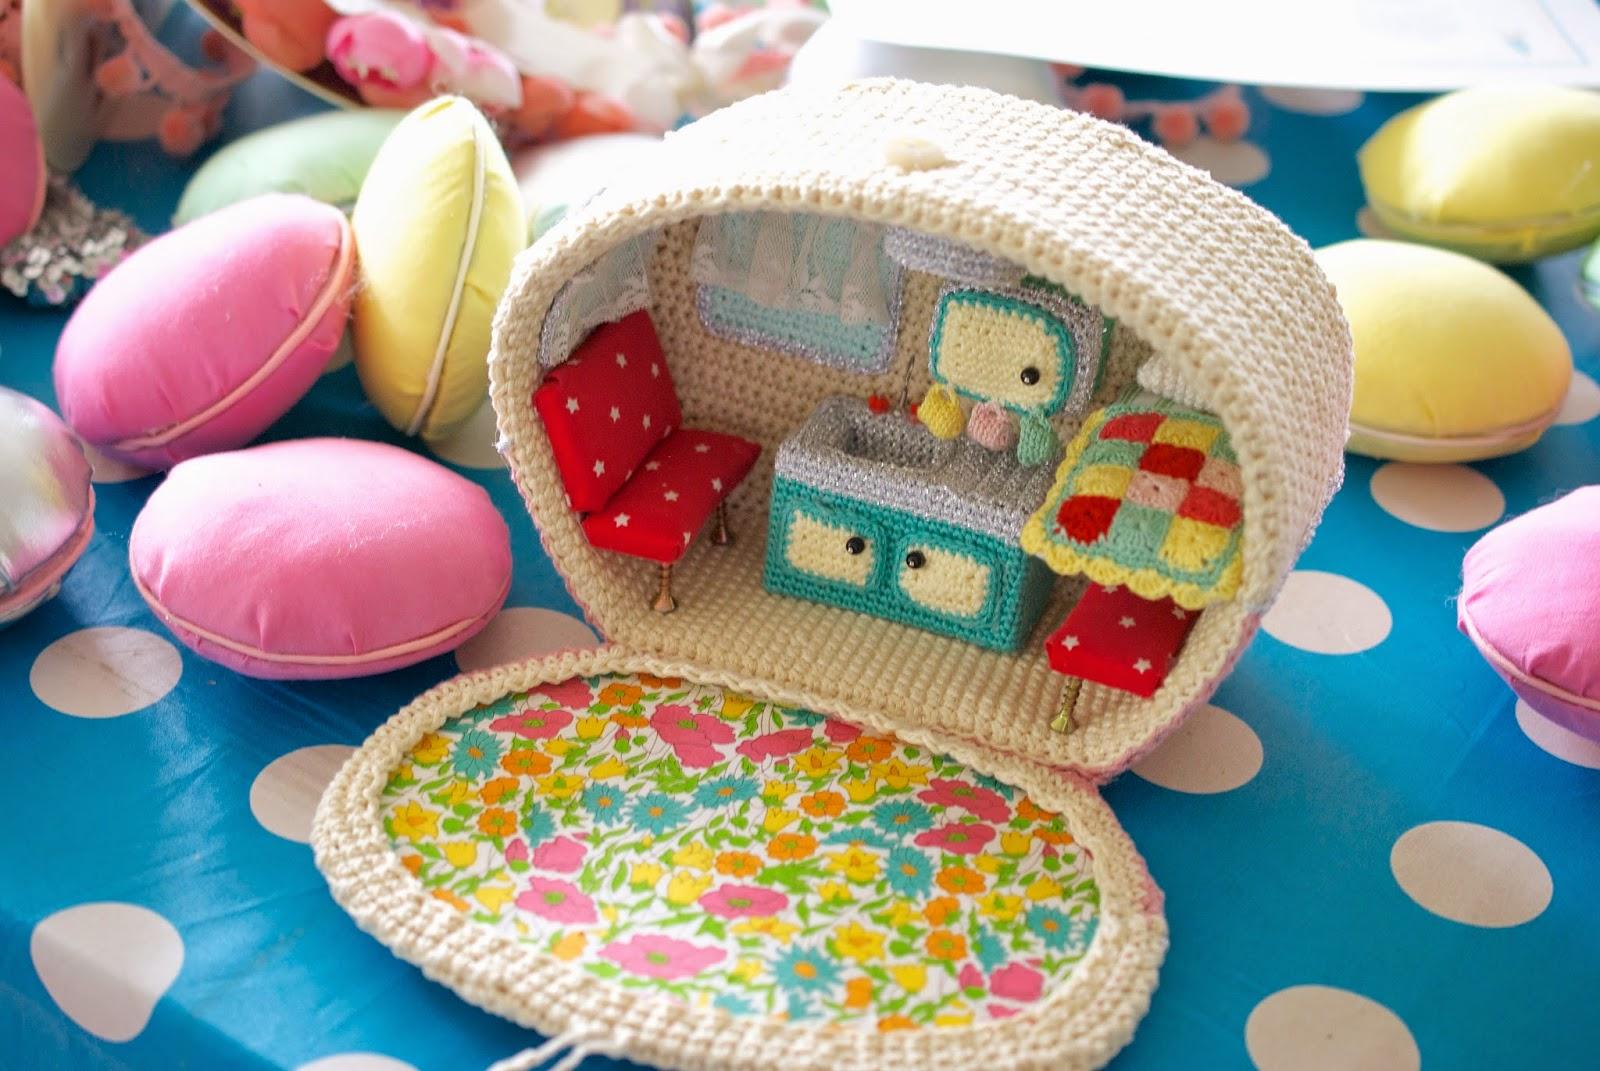 Hausverk Ufe ドールハウス キャラバン 海外編み物 かぎ針で編む可愛いハウス 小物 雑貨作品集 naver まとめ